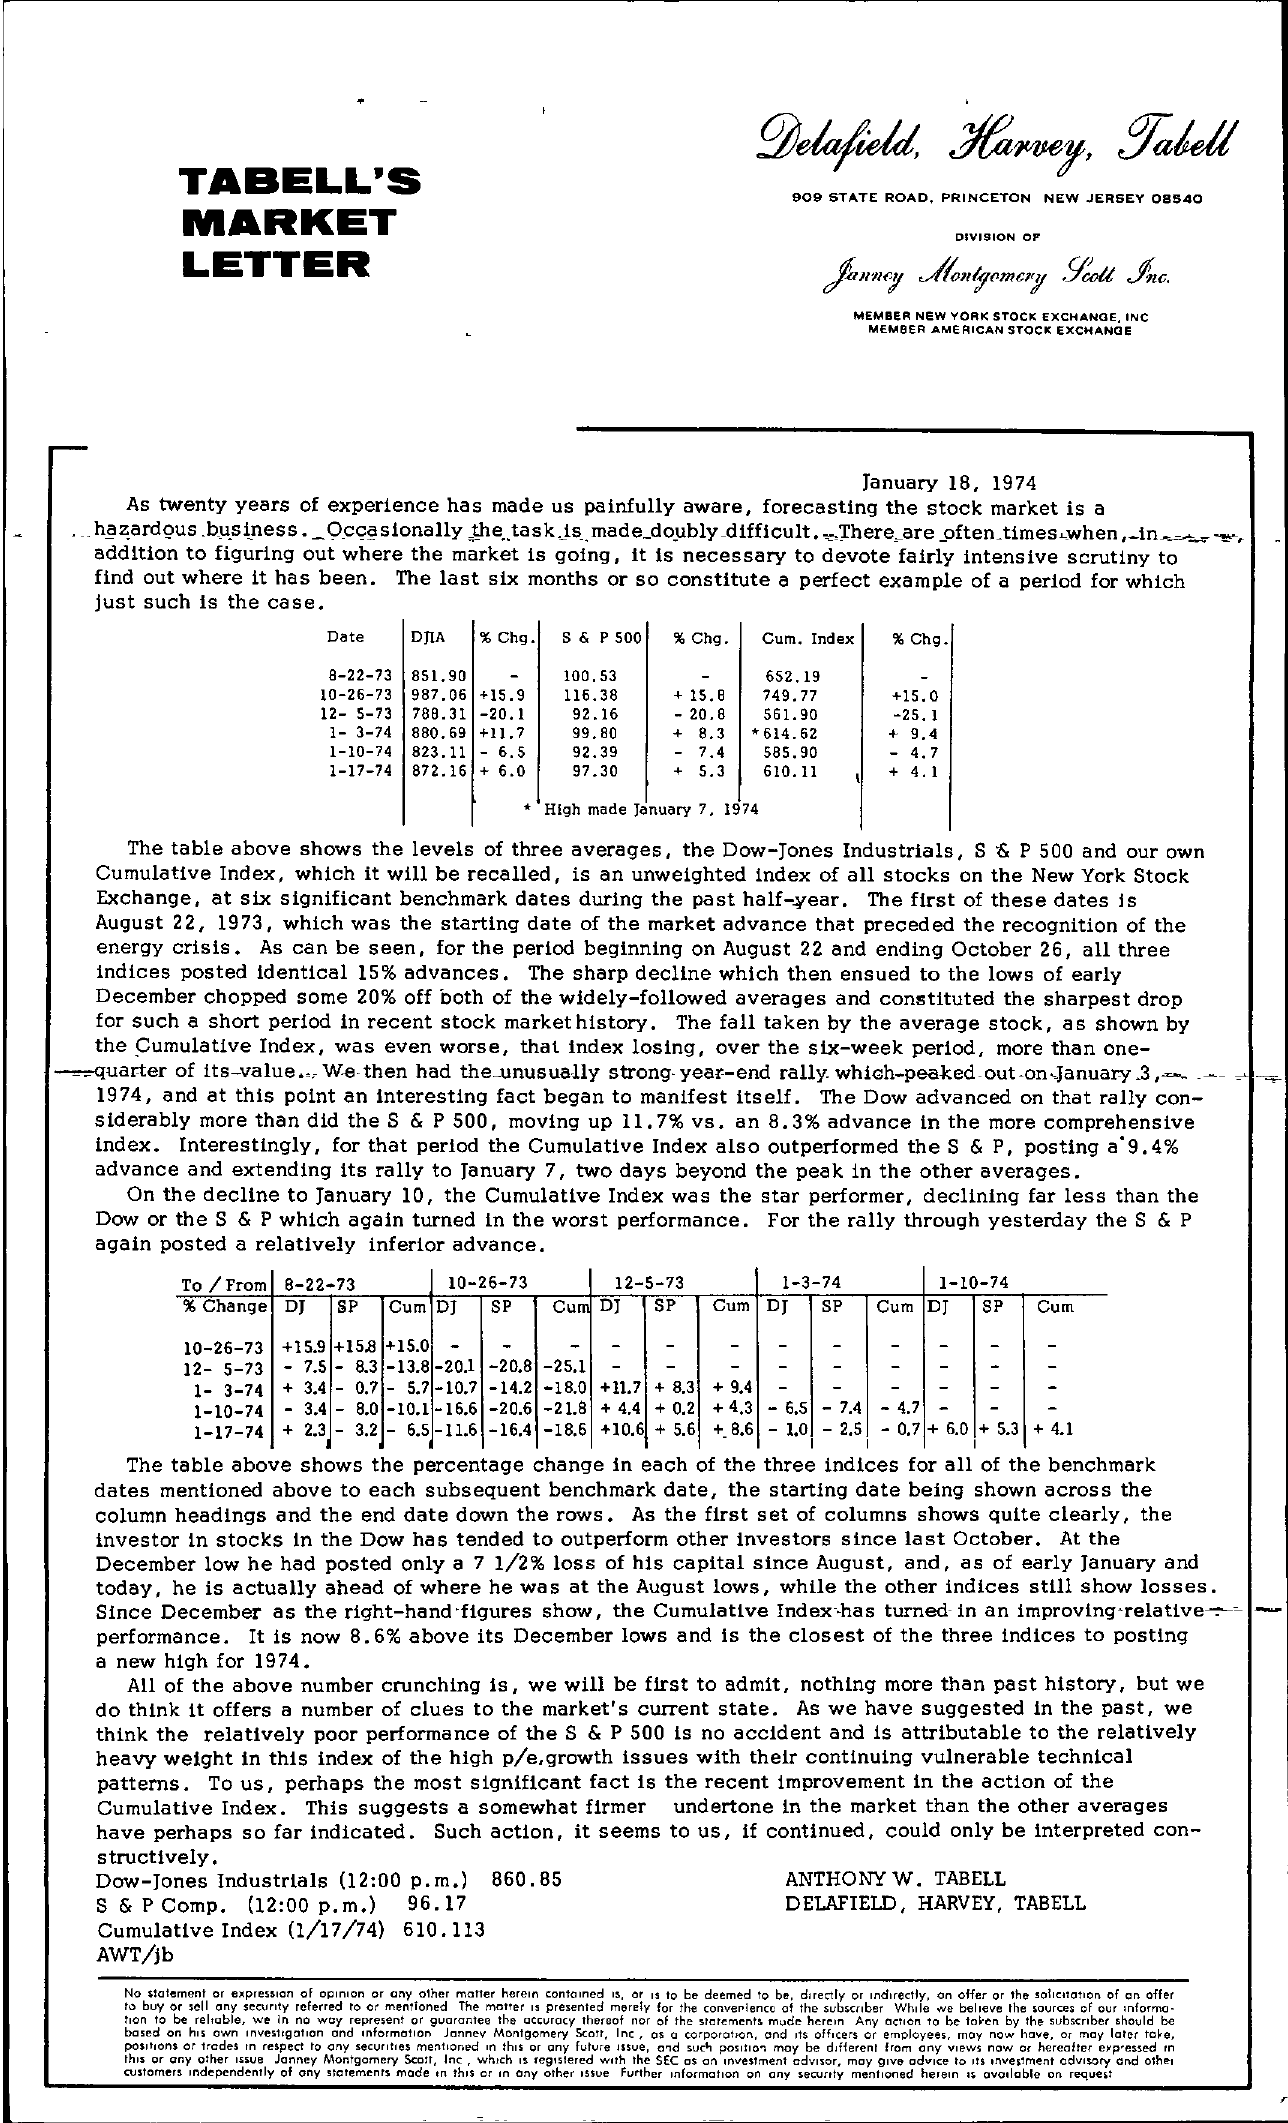 Tabell's Market Letter - January 18, 1974